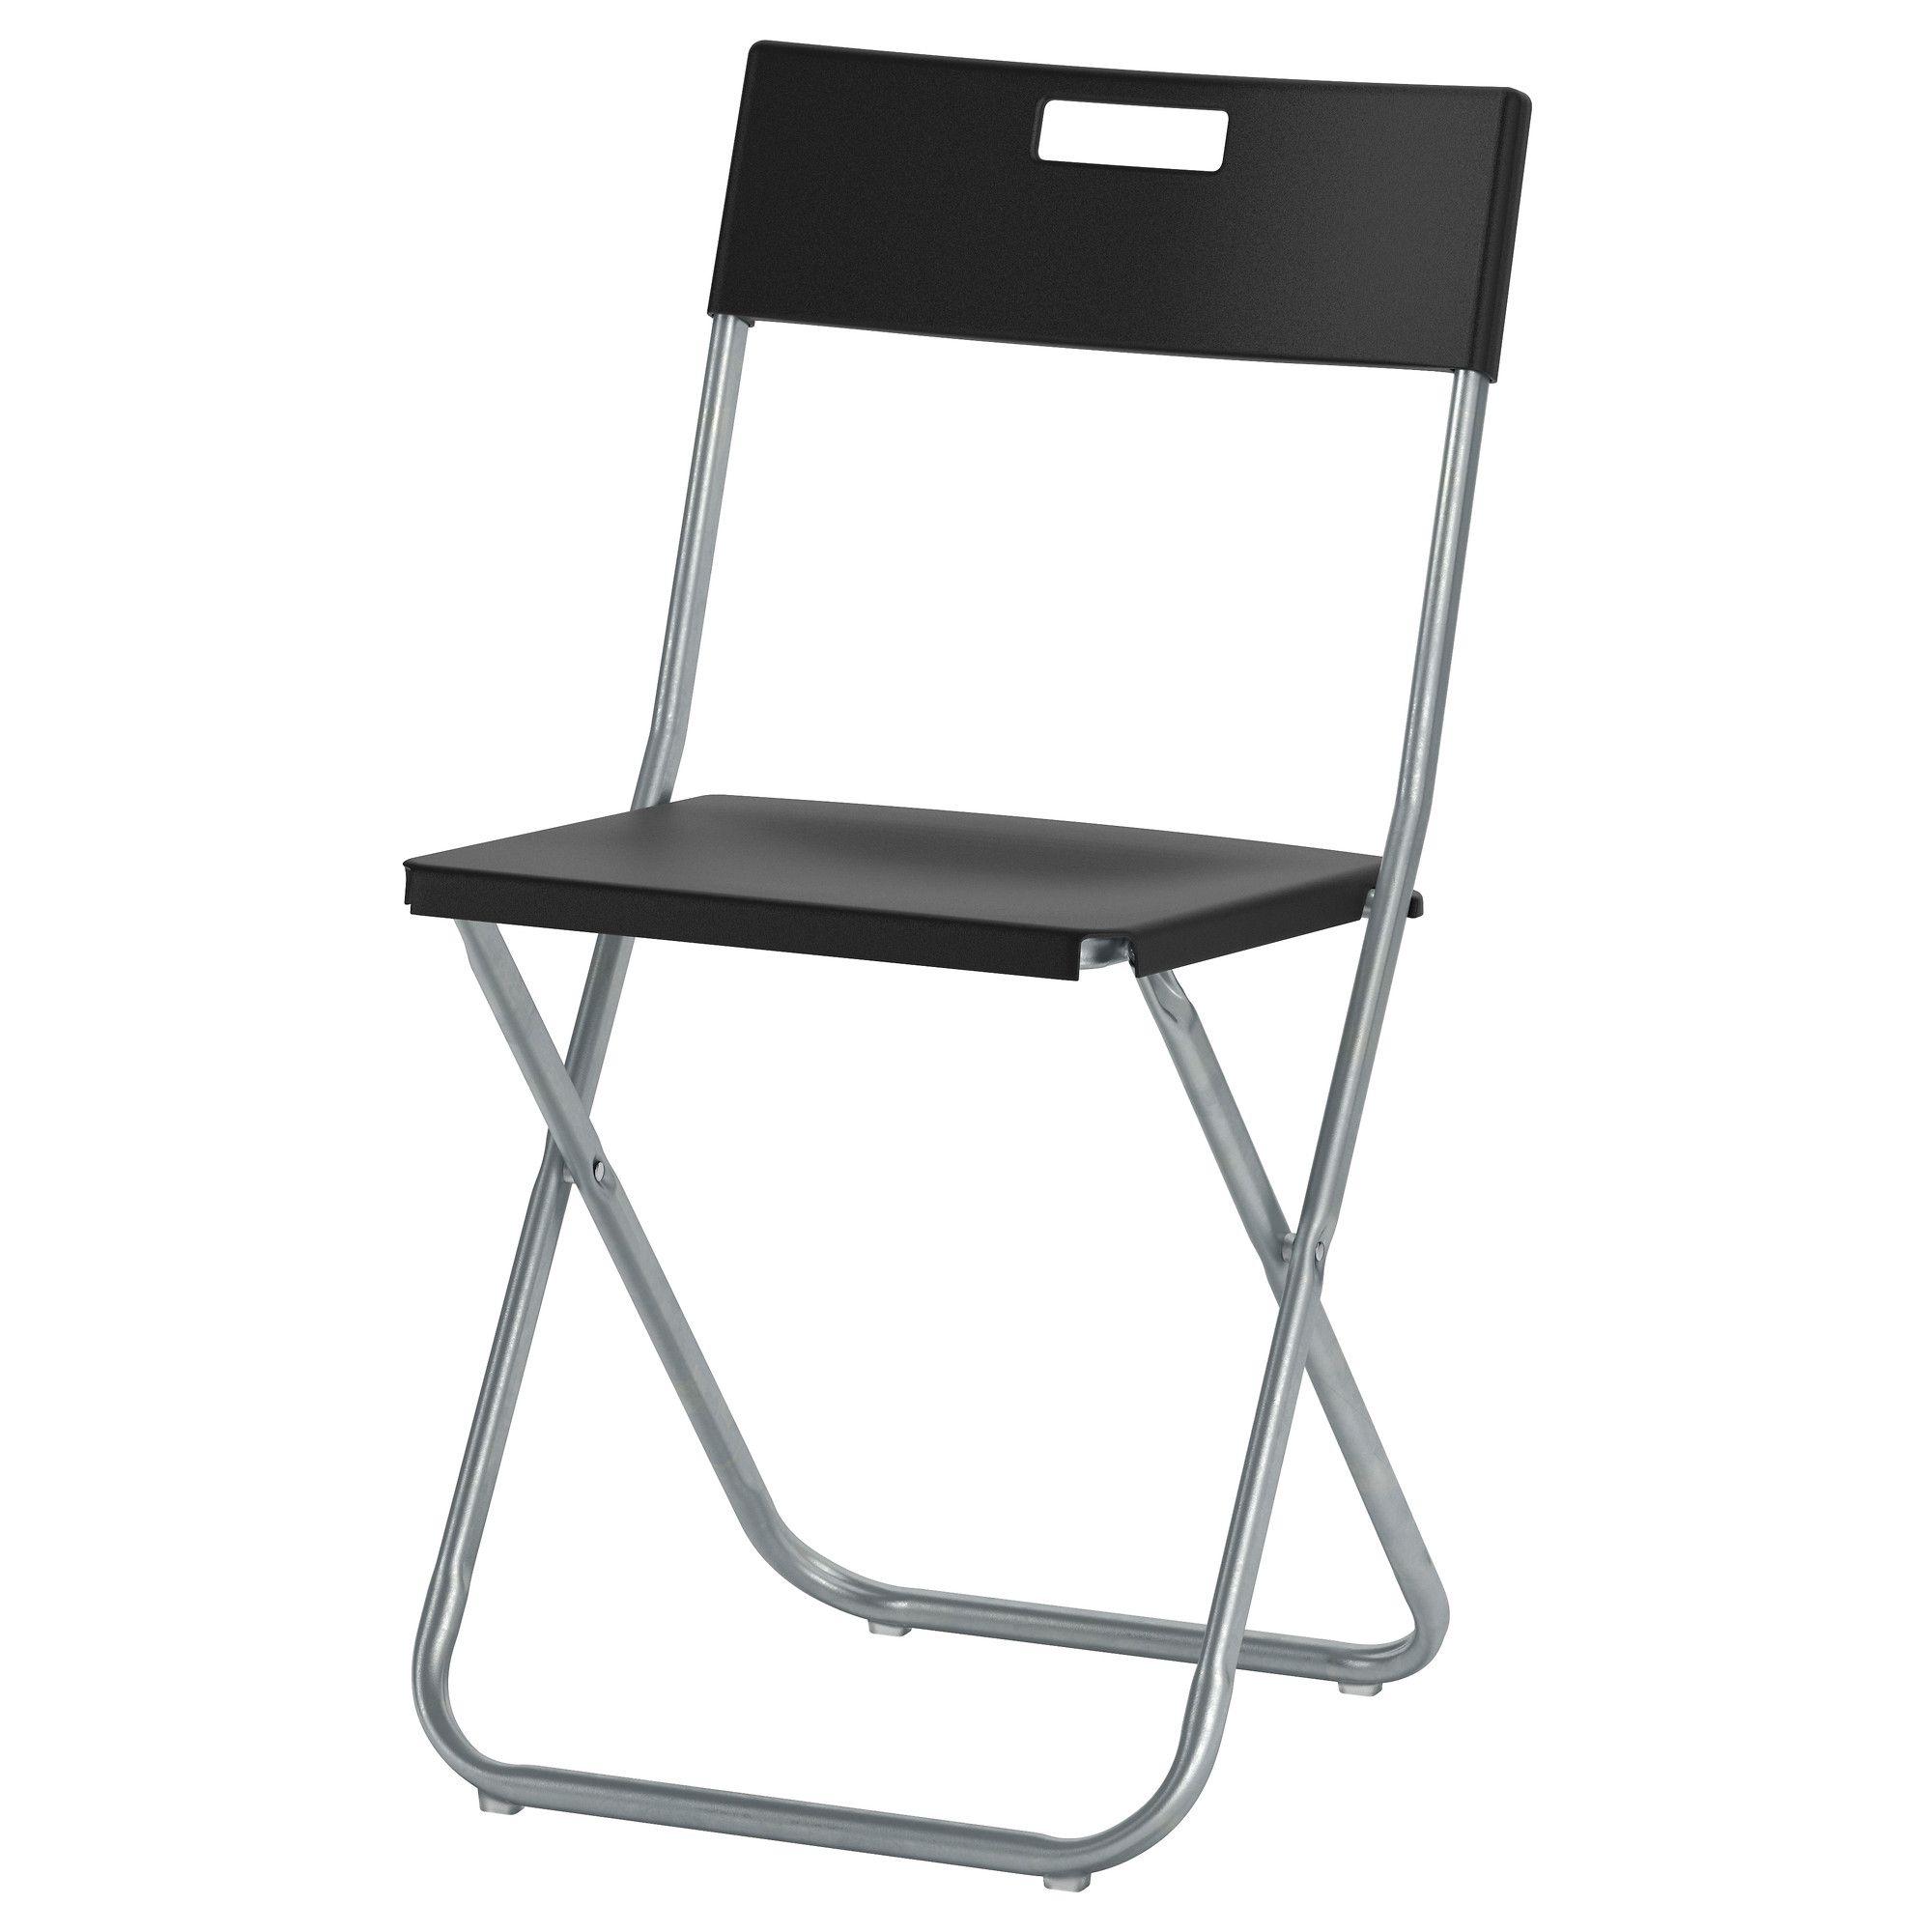 Gunde Folding Chair Black Folding Chair Ikea Folding Chairs